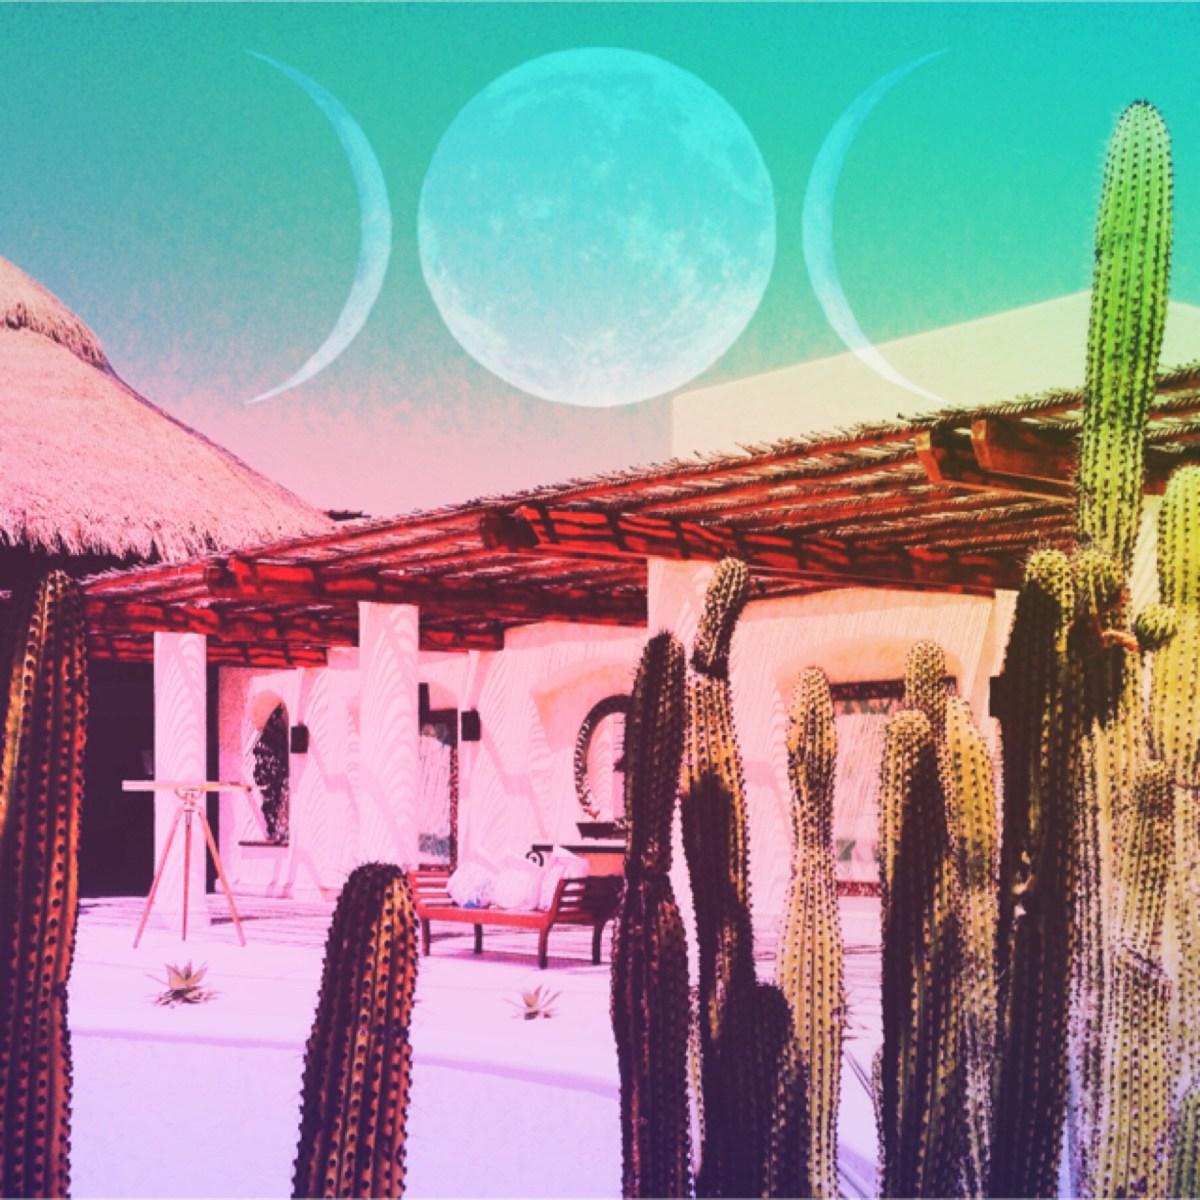 Rainbow-Love-App-Moon-Goddess-Filter-Blog-Post-2